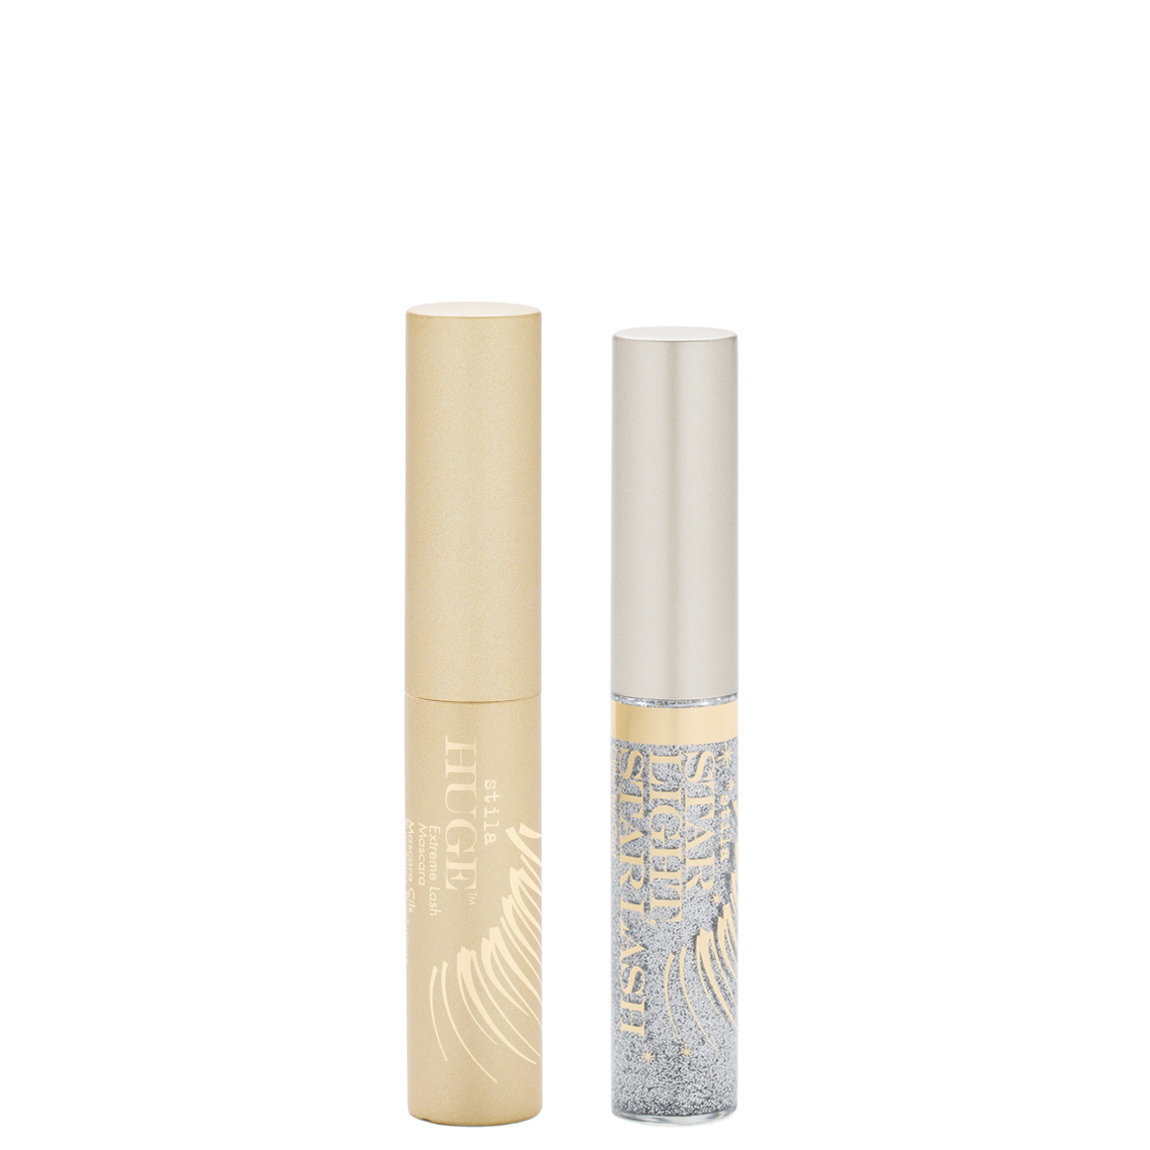 Stila Fringe With Benefits - Star Light, Star Lash Glitter Top Cot & Huge Extreme Lash Mascara alternative view 1.